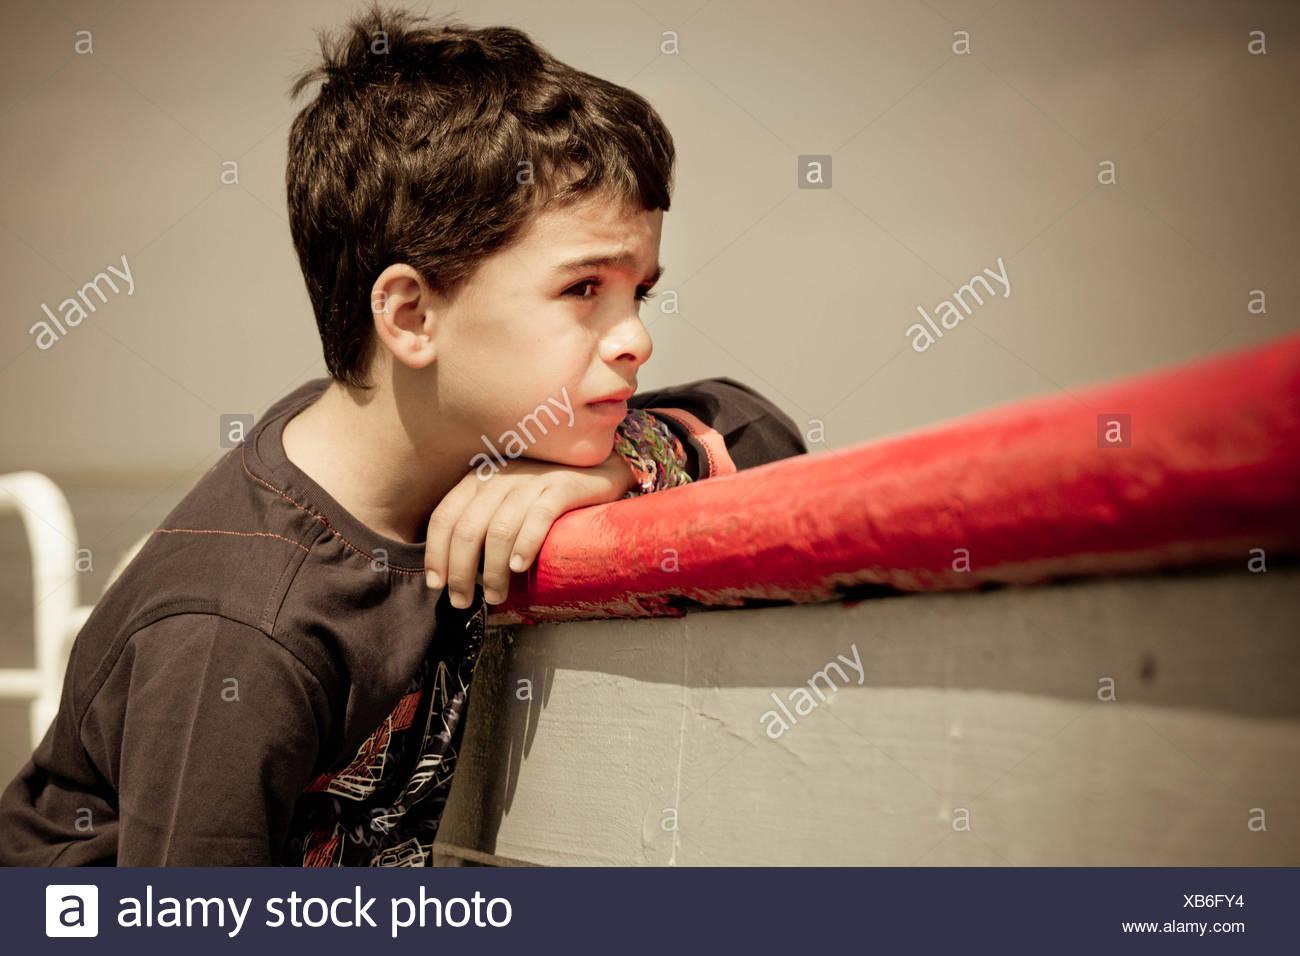 Spain, Portrait of melancholic boy - Stock Image